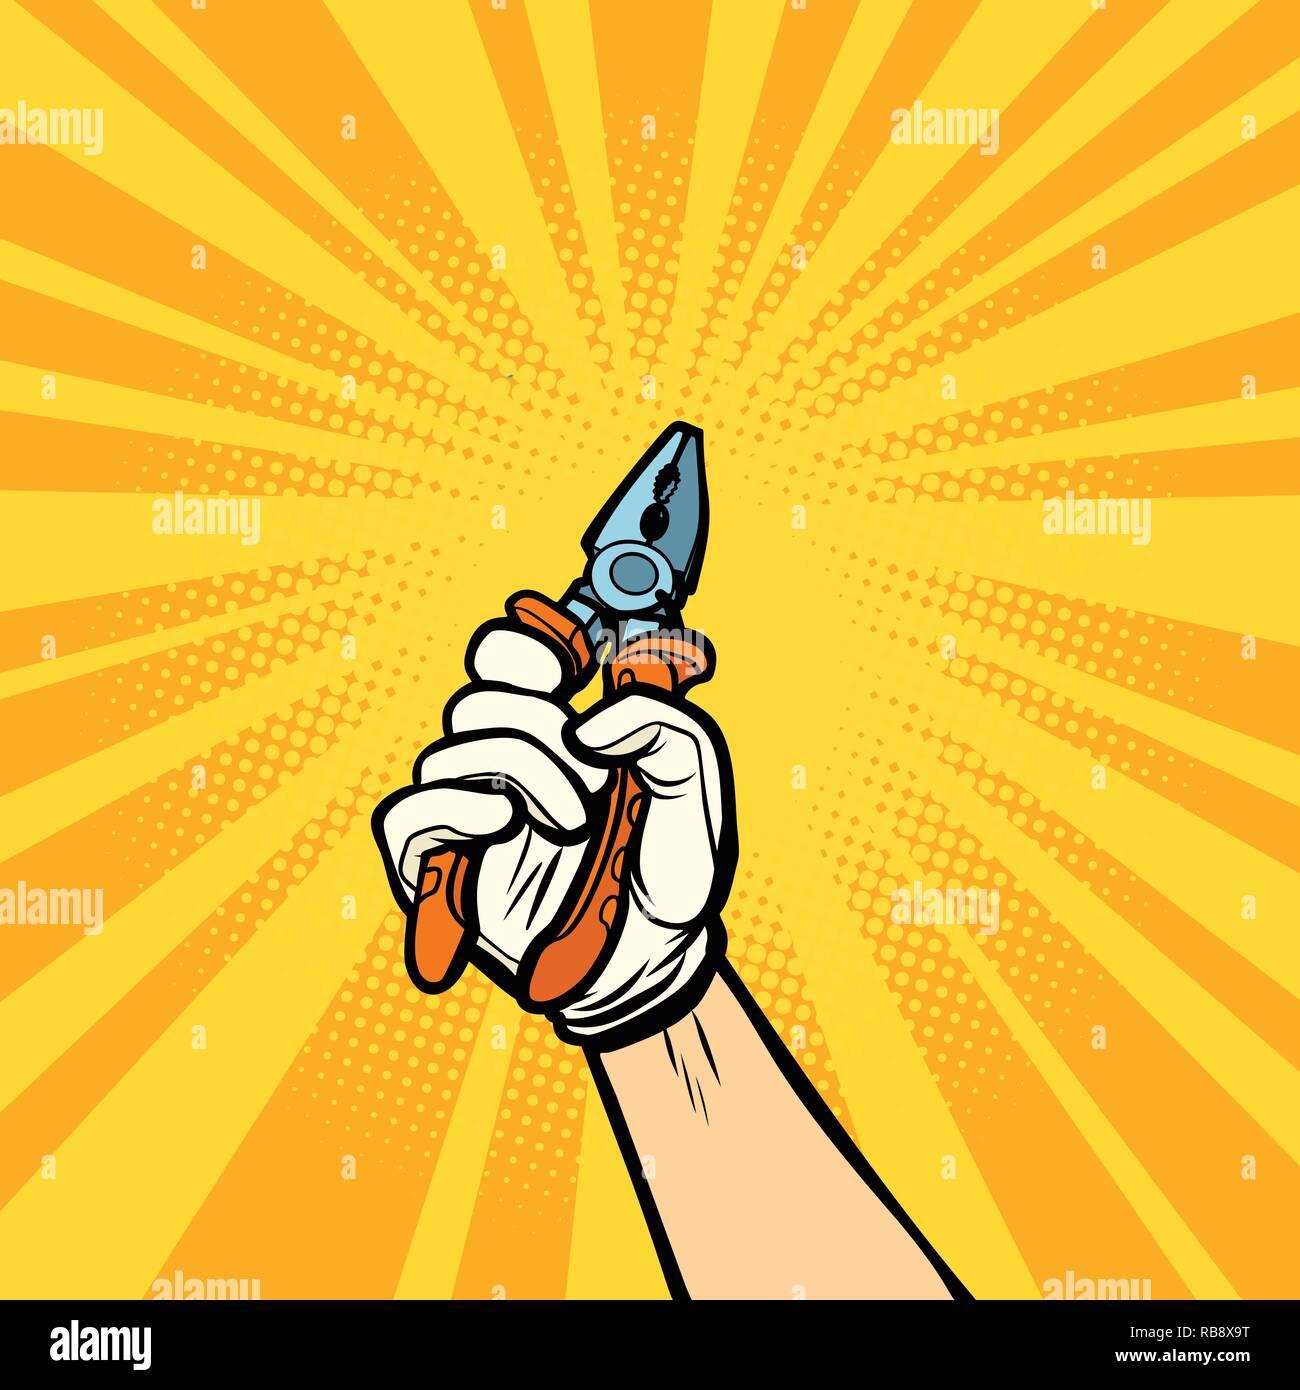 hand with pliers, work tool. Comic cartoon pop art retro vector illustration drawing - Stock Vector